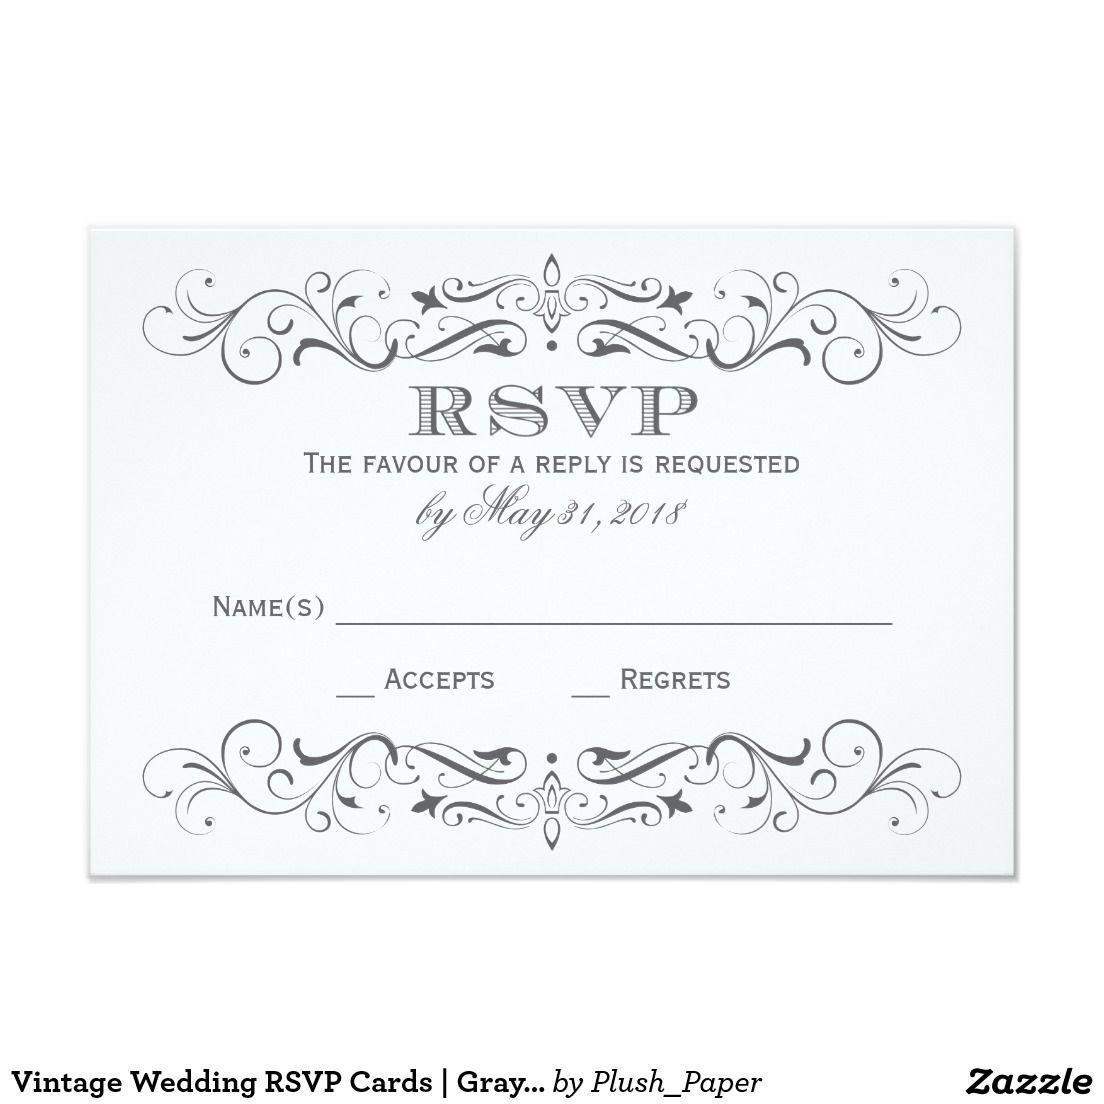 Vintage Wedding RSVP Cards | Gray Elegant Flourish | Wedding rsvp ...